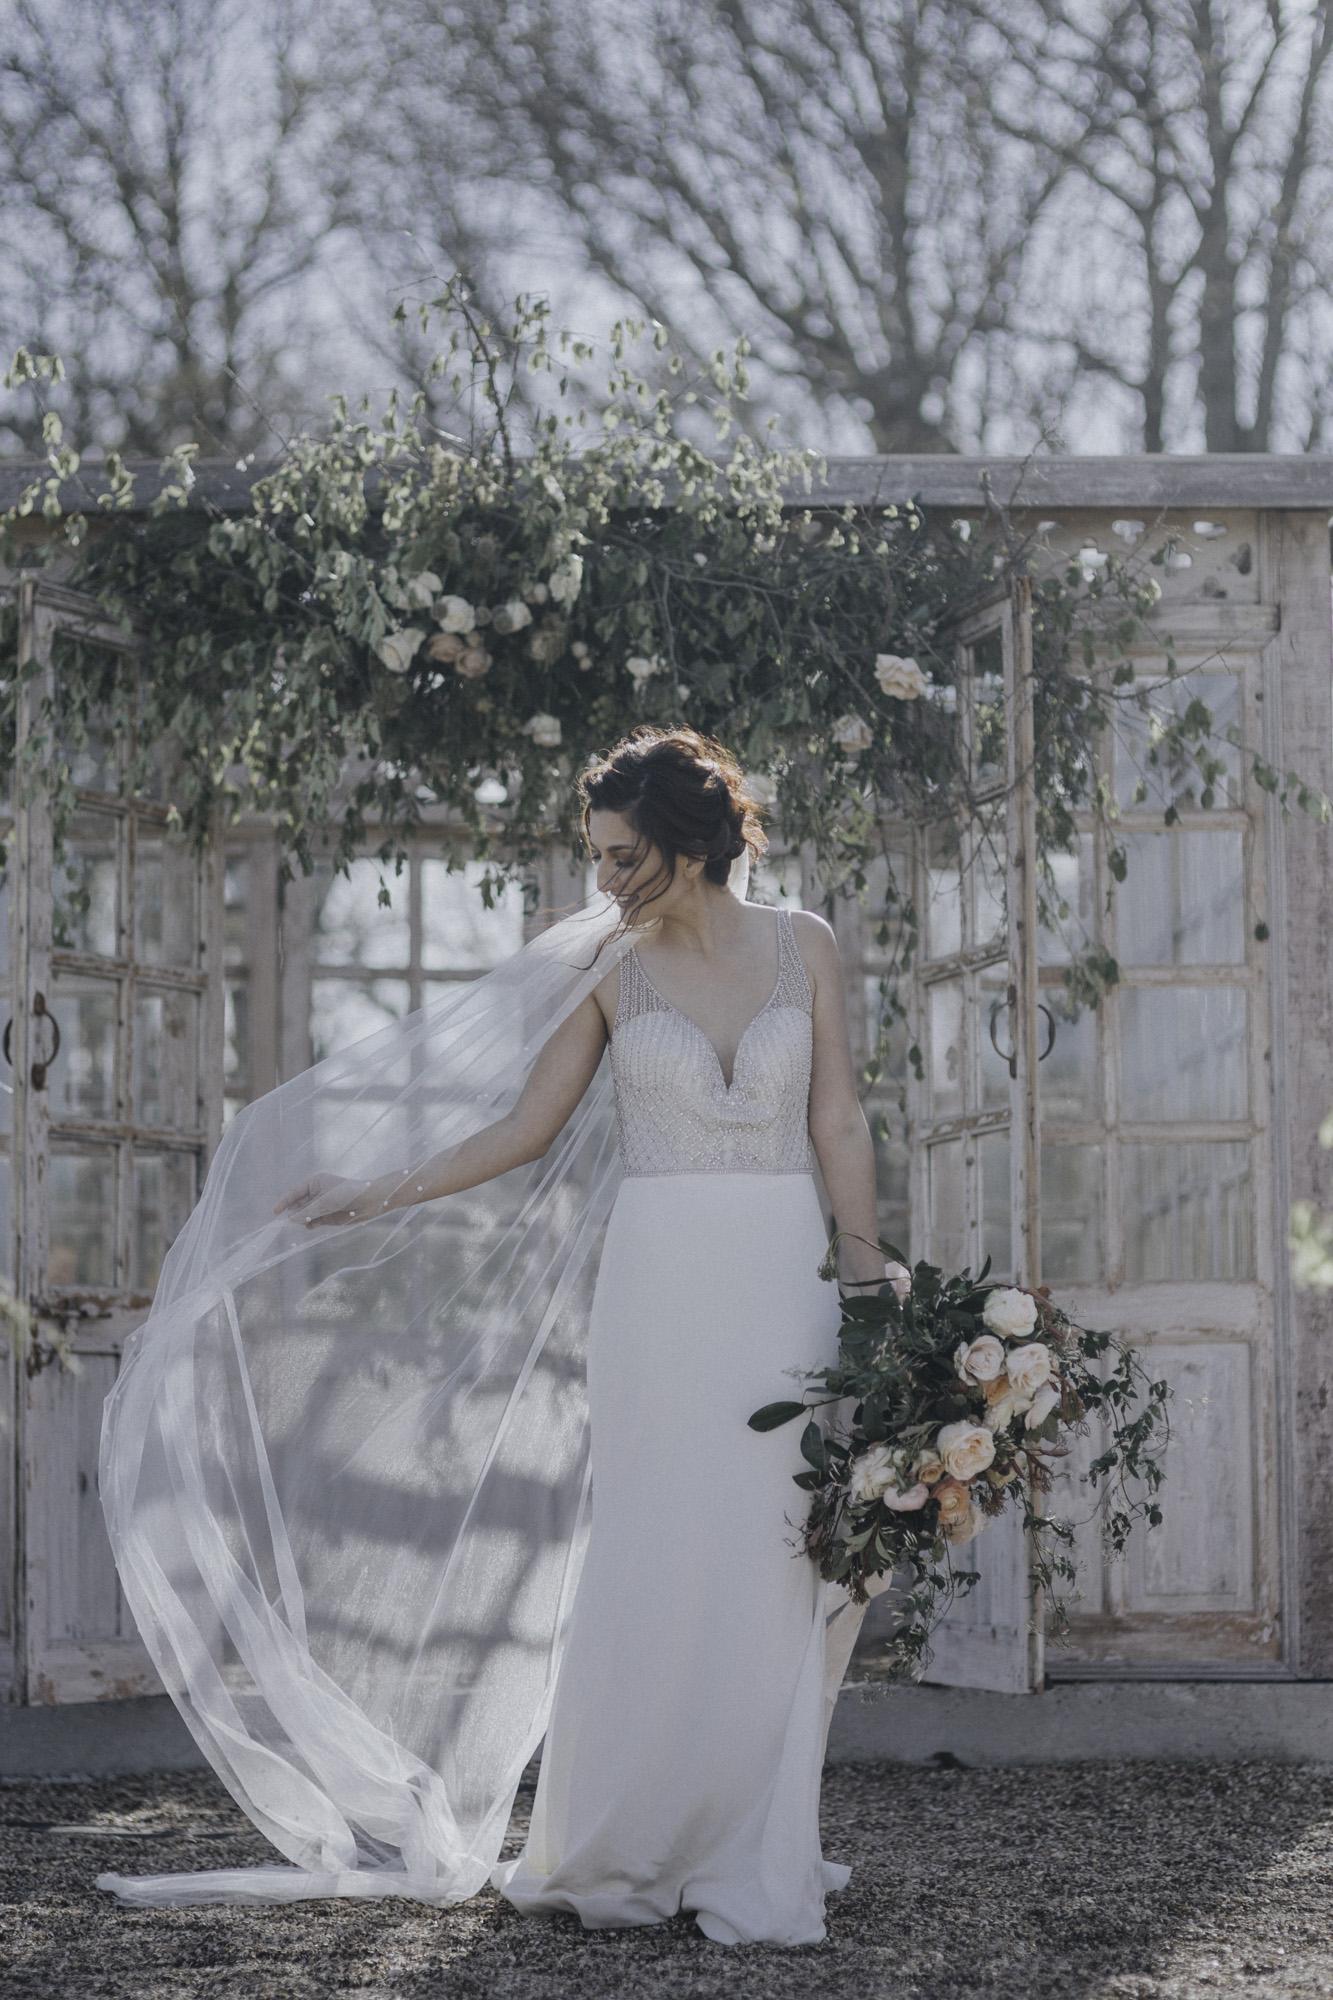 Cate_Ann_Photography_Dayton_Ohio_Wedding_Elopement_And_Engagement_PhotographerIMG_8482.jpg